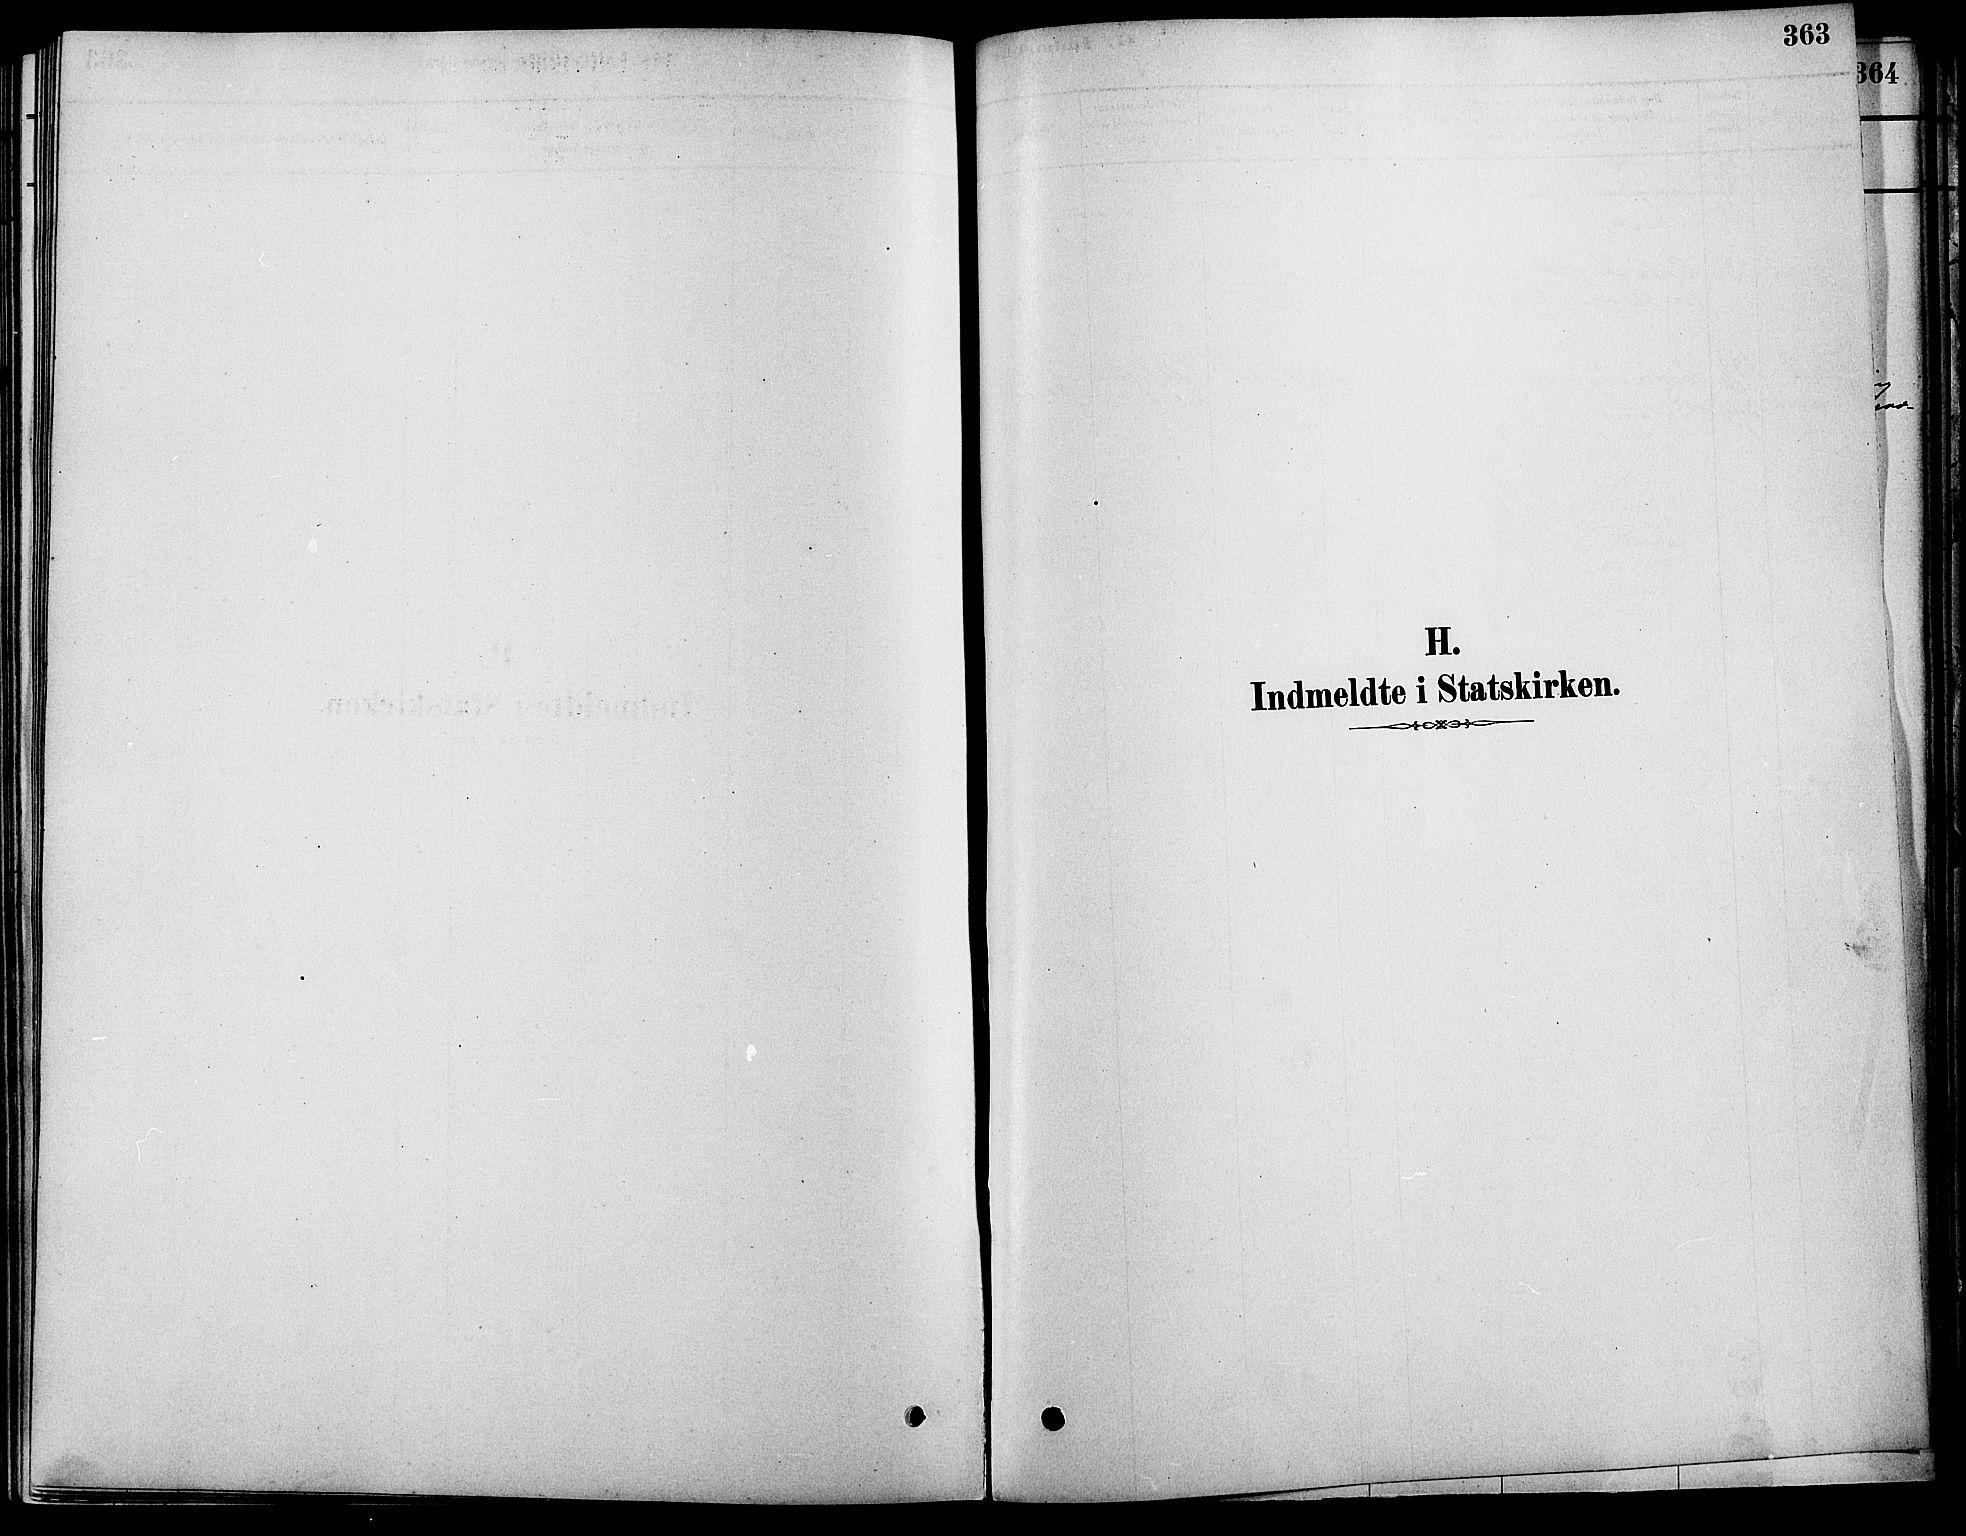 SAH, Fåberg prestekontor, Ministerialbok nr. 8, 1879-1898, s. 363